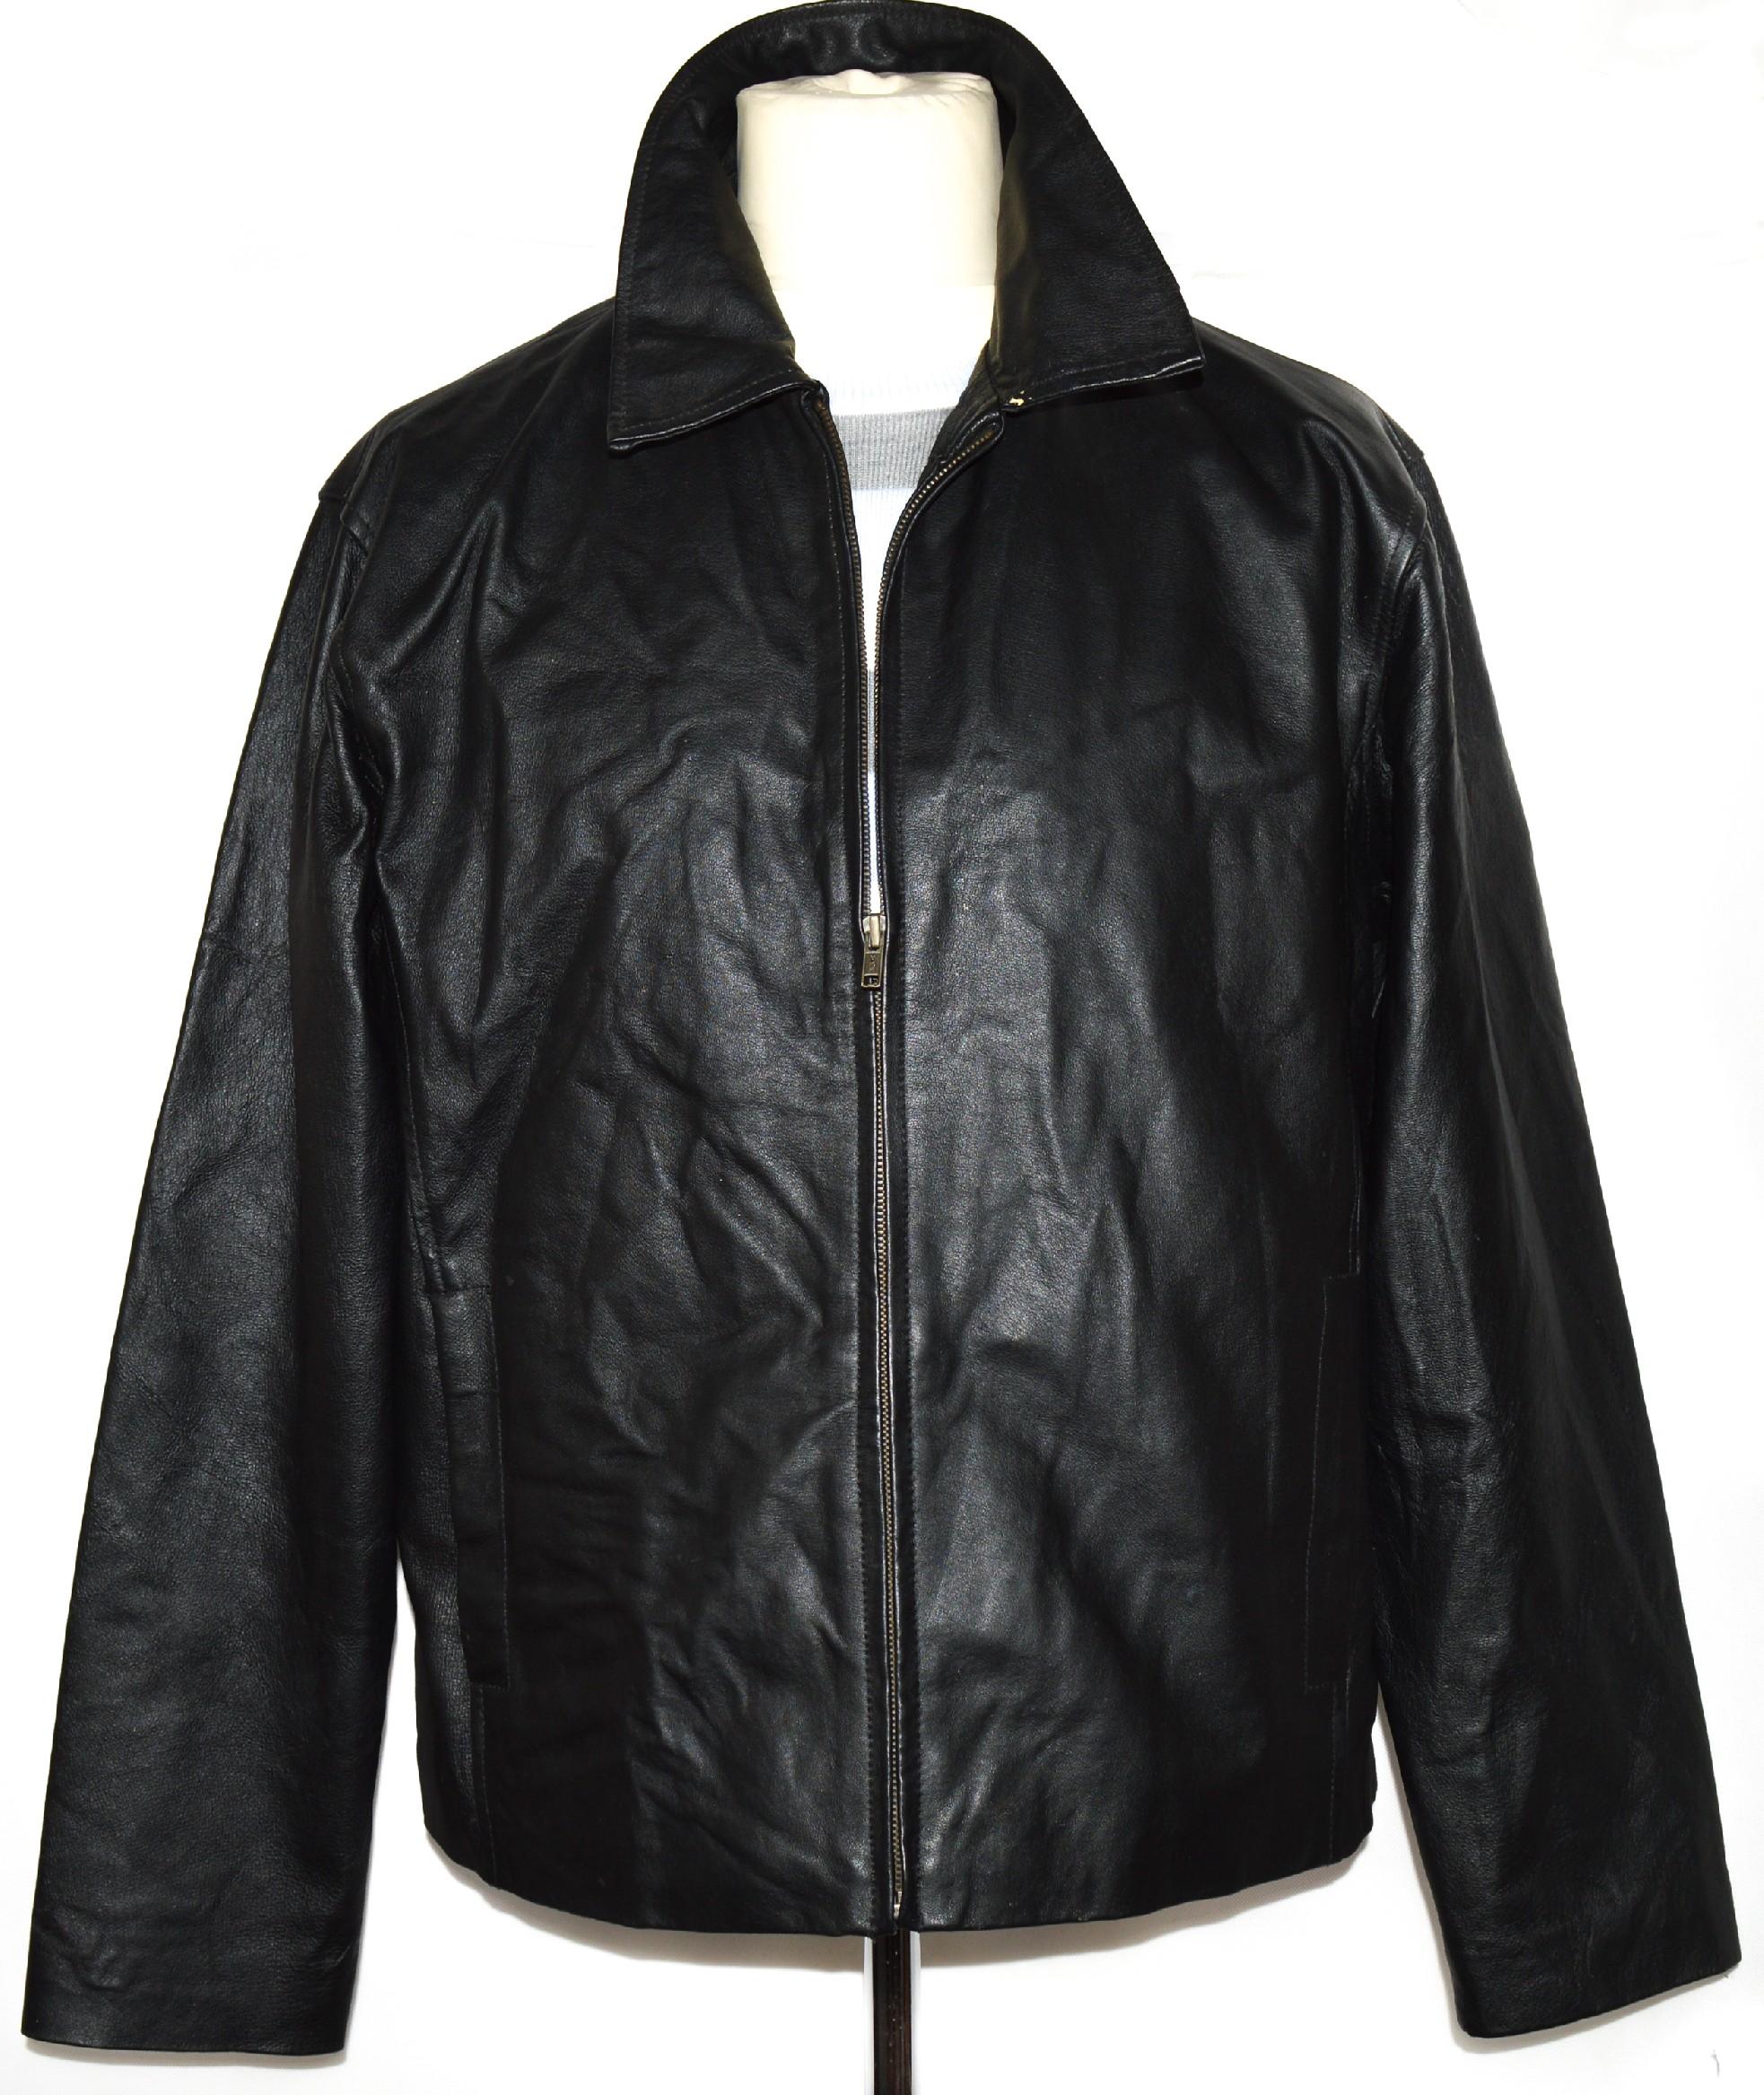 KOŽENÁ pánská černá bunda na zip ZERO L